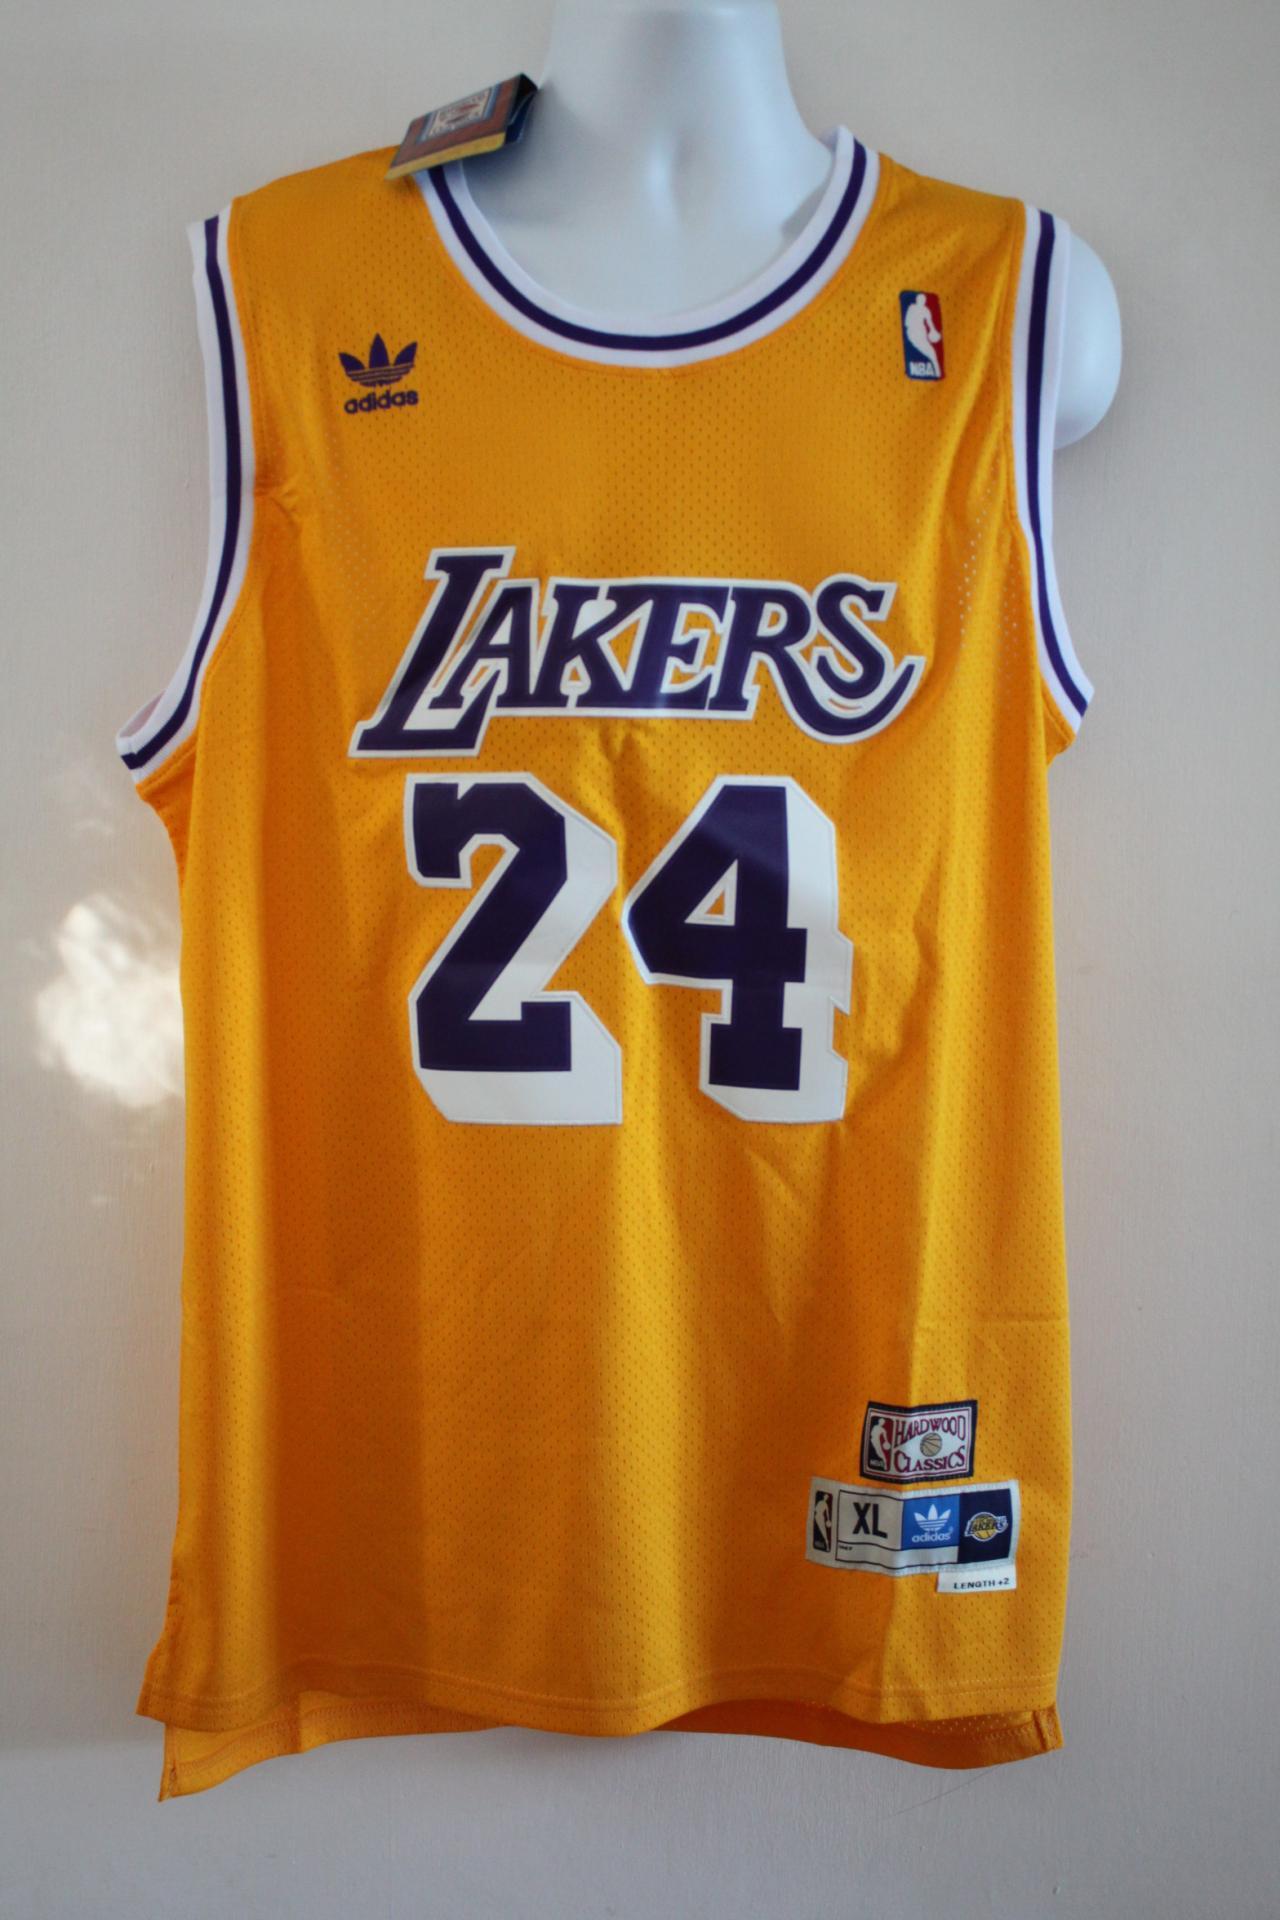 09eb384df80 Cougar. Cougar. Cougar. Cougar. Item Description. Adidas NBA Los Angeles  Lakers 24 Kobe Bryant Hardwood Classics Basketball Yellow Jersey Top